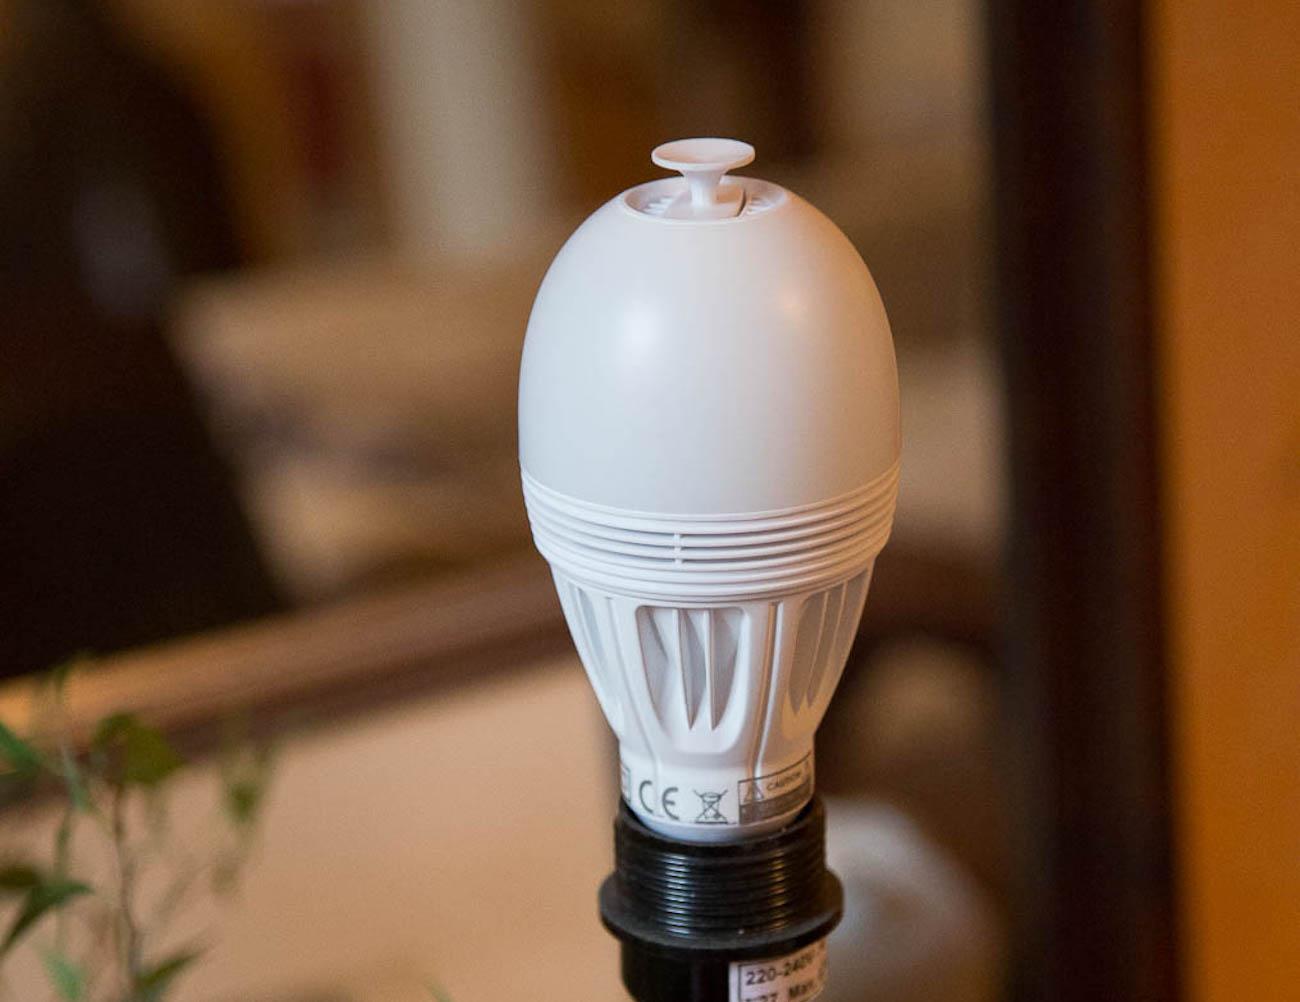 AromaLIGHT – Aroma Diffusing Light Bulb by AwoX